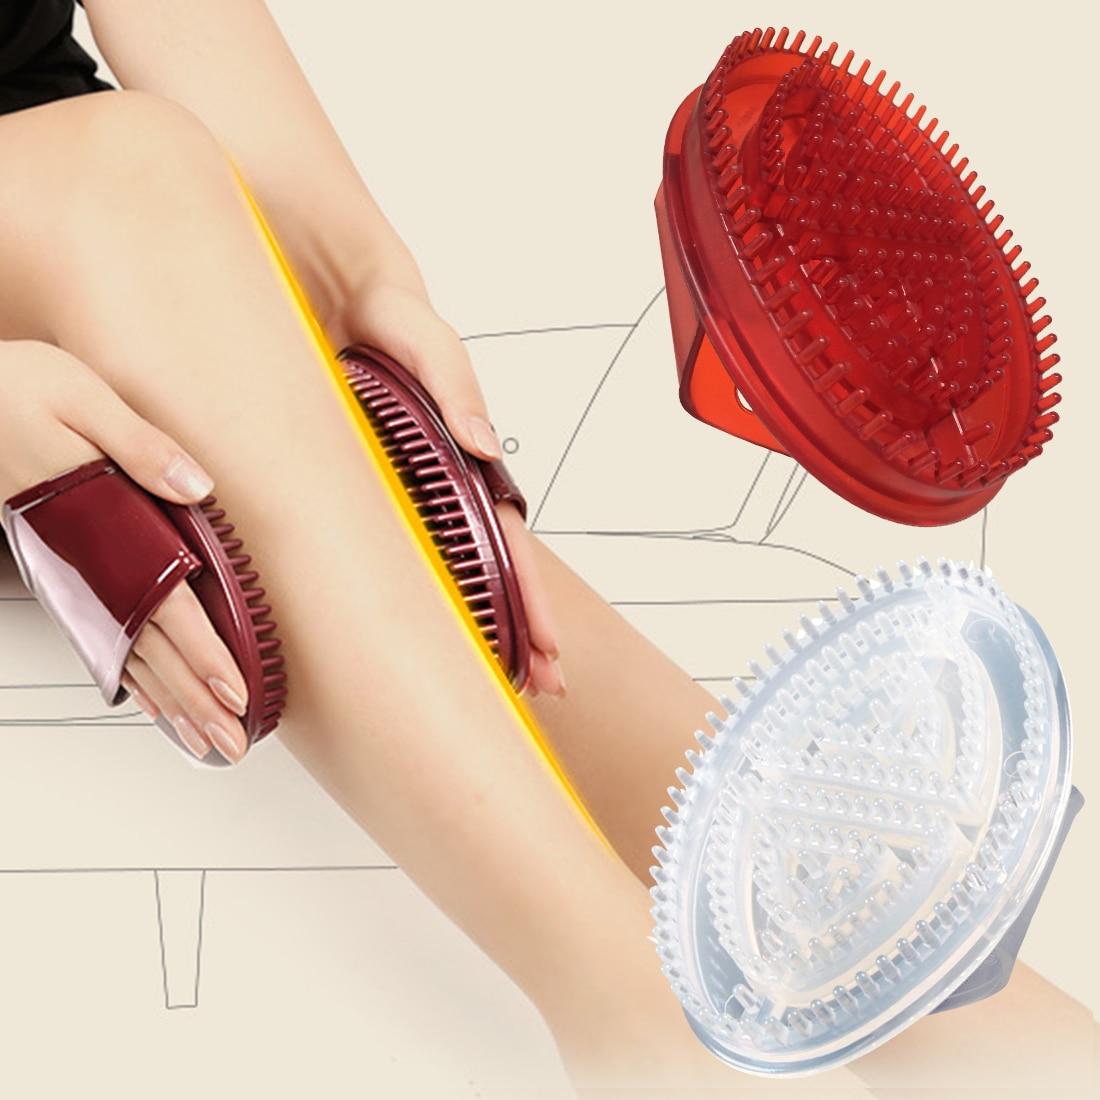 Top Bath Shower Anti Cellulite Full Handheld Body Relaxtion Soomthen Five Elements Meridian Brush Honeycomb Full Gloves